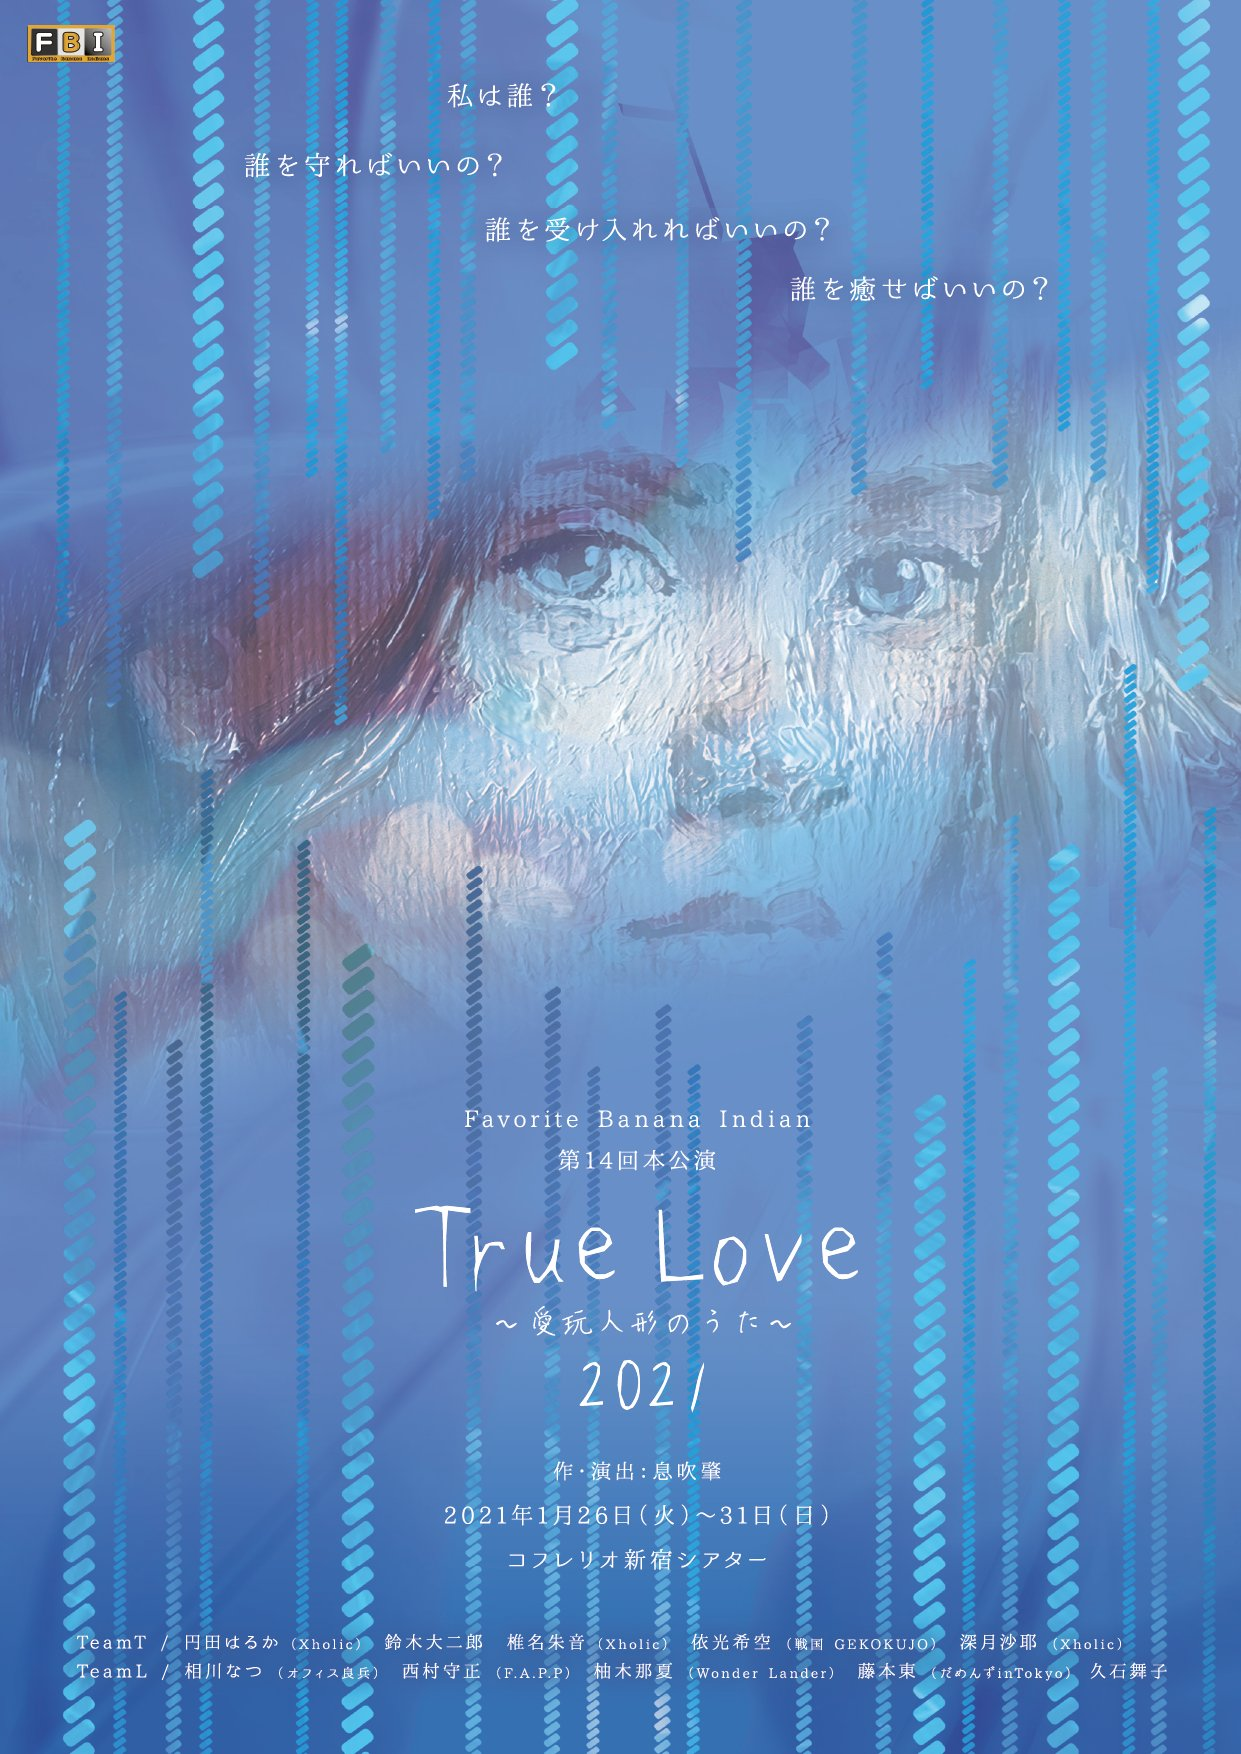 rue Love〜愛玩人形のうた〜 2021